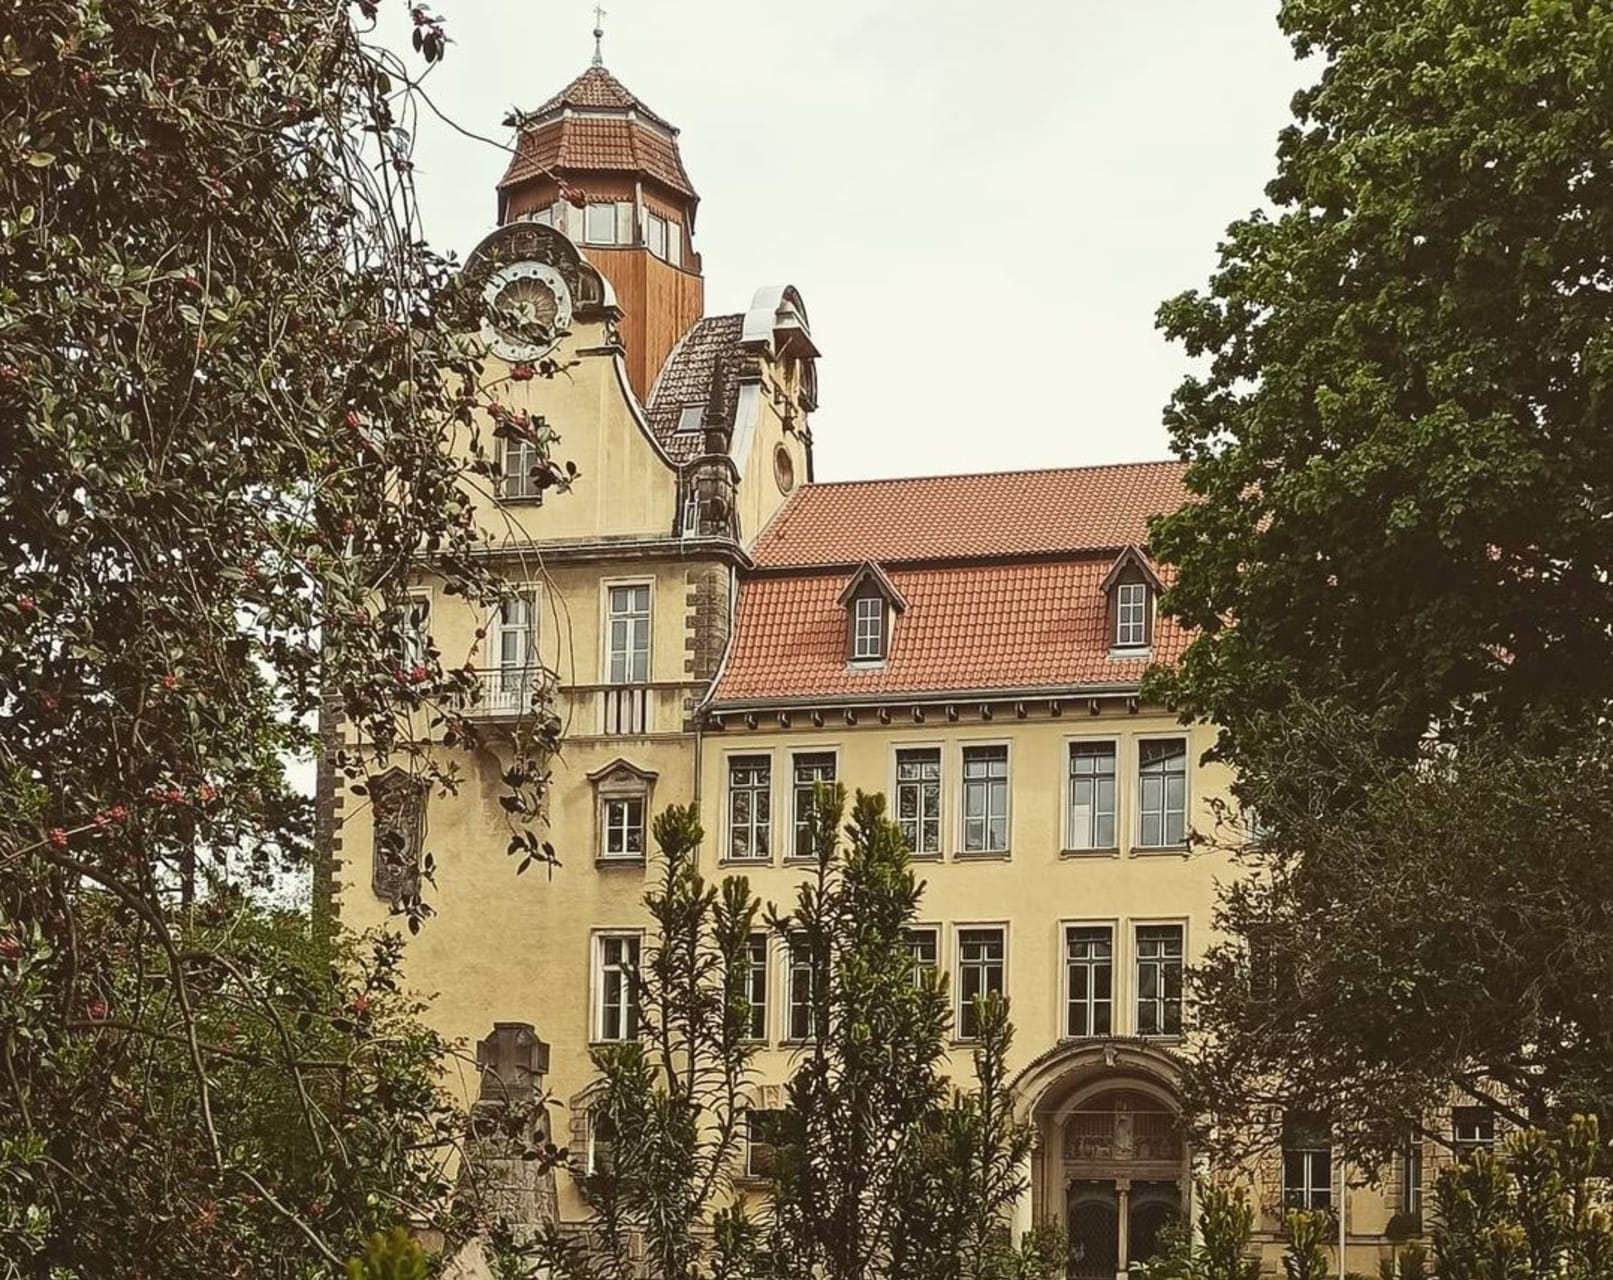 Berlin - An Evening Walk with Lukas and Martin, Part 2